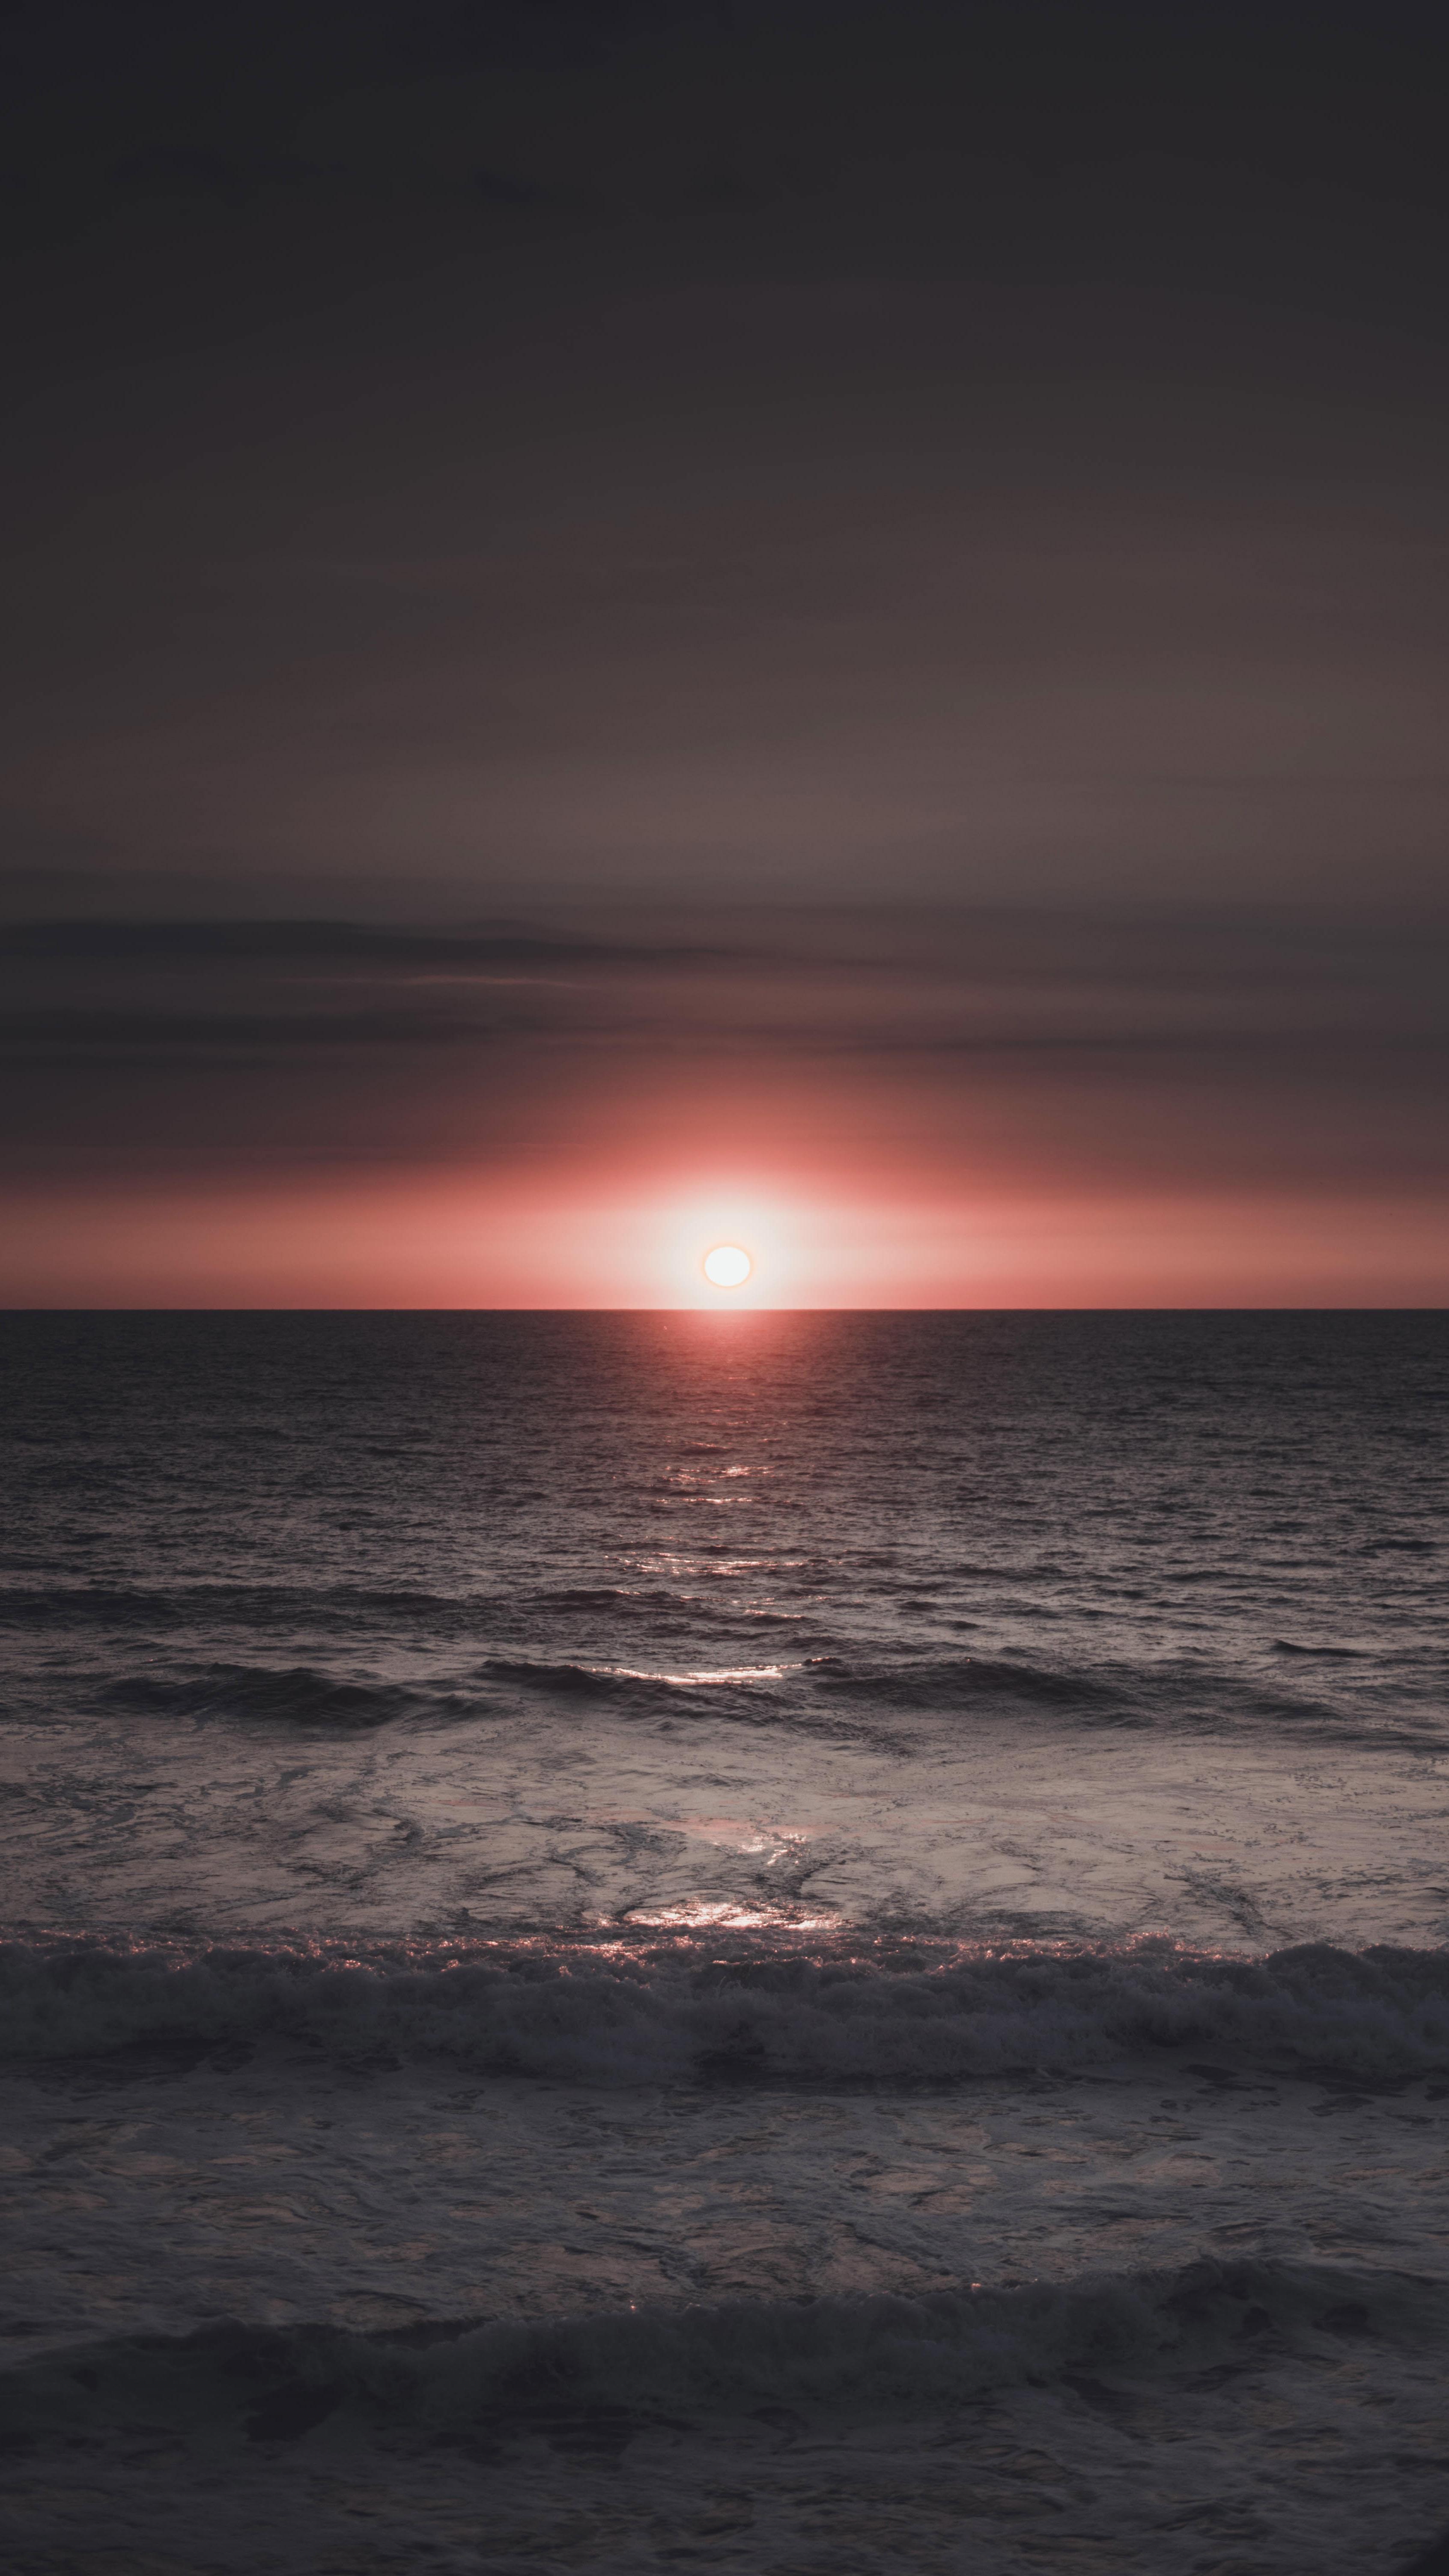 ocean under sunset